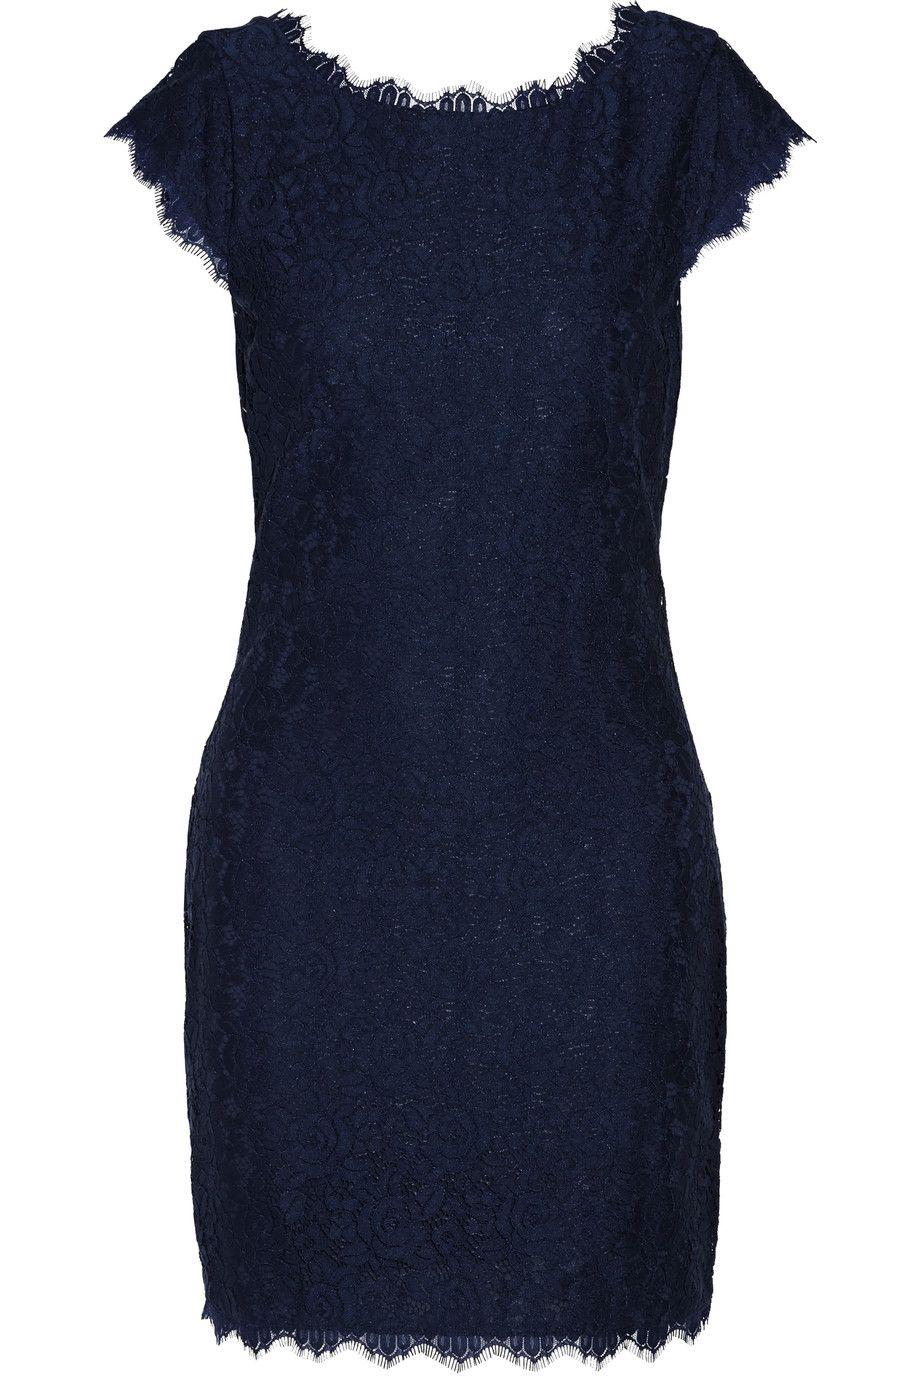 DIANE VON FURSTENBERG Barbara lace mini dress. #dianevonfurstenberg #cloth #dress